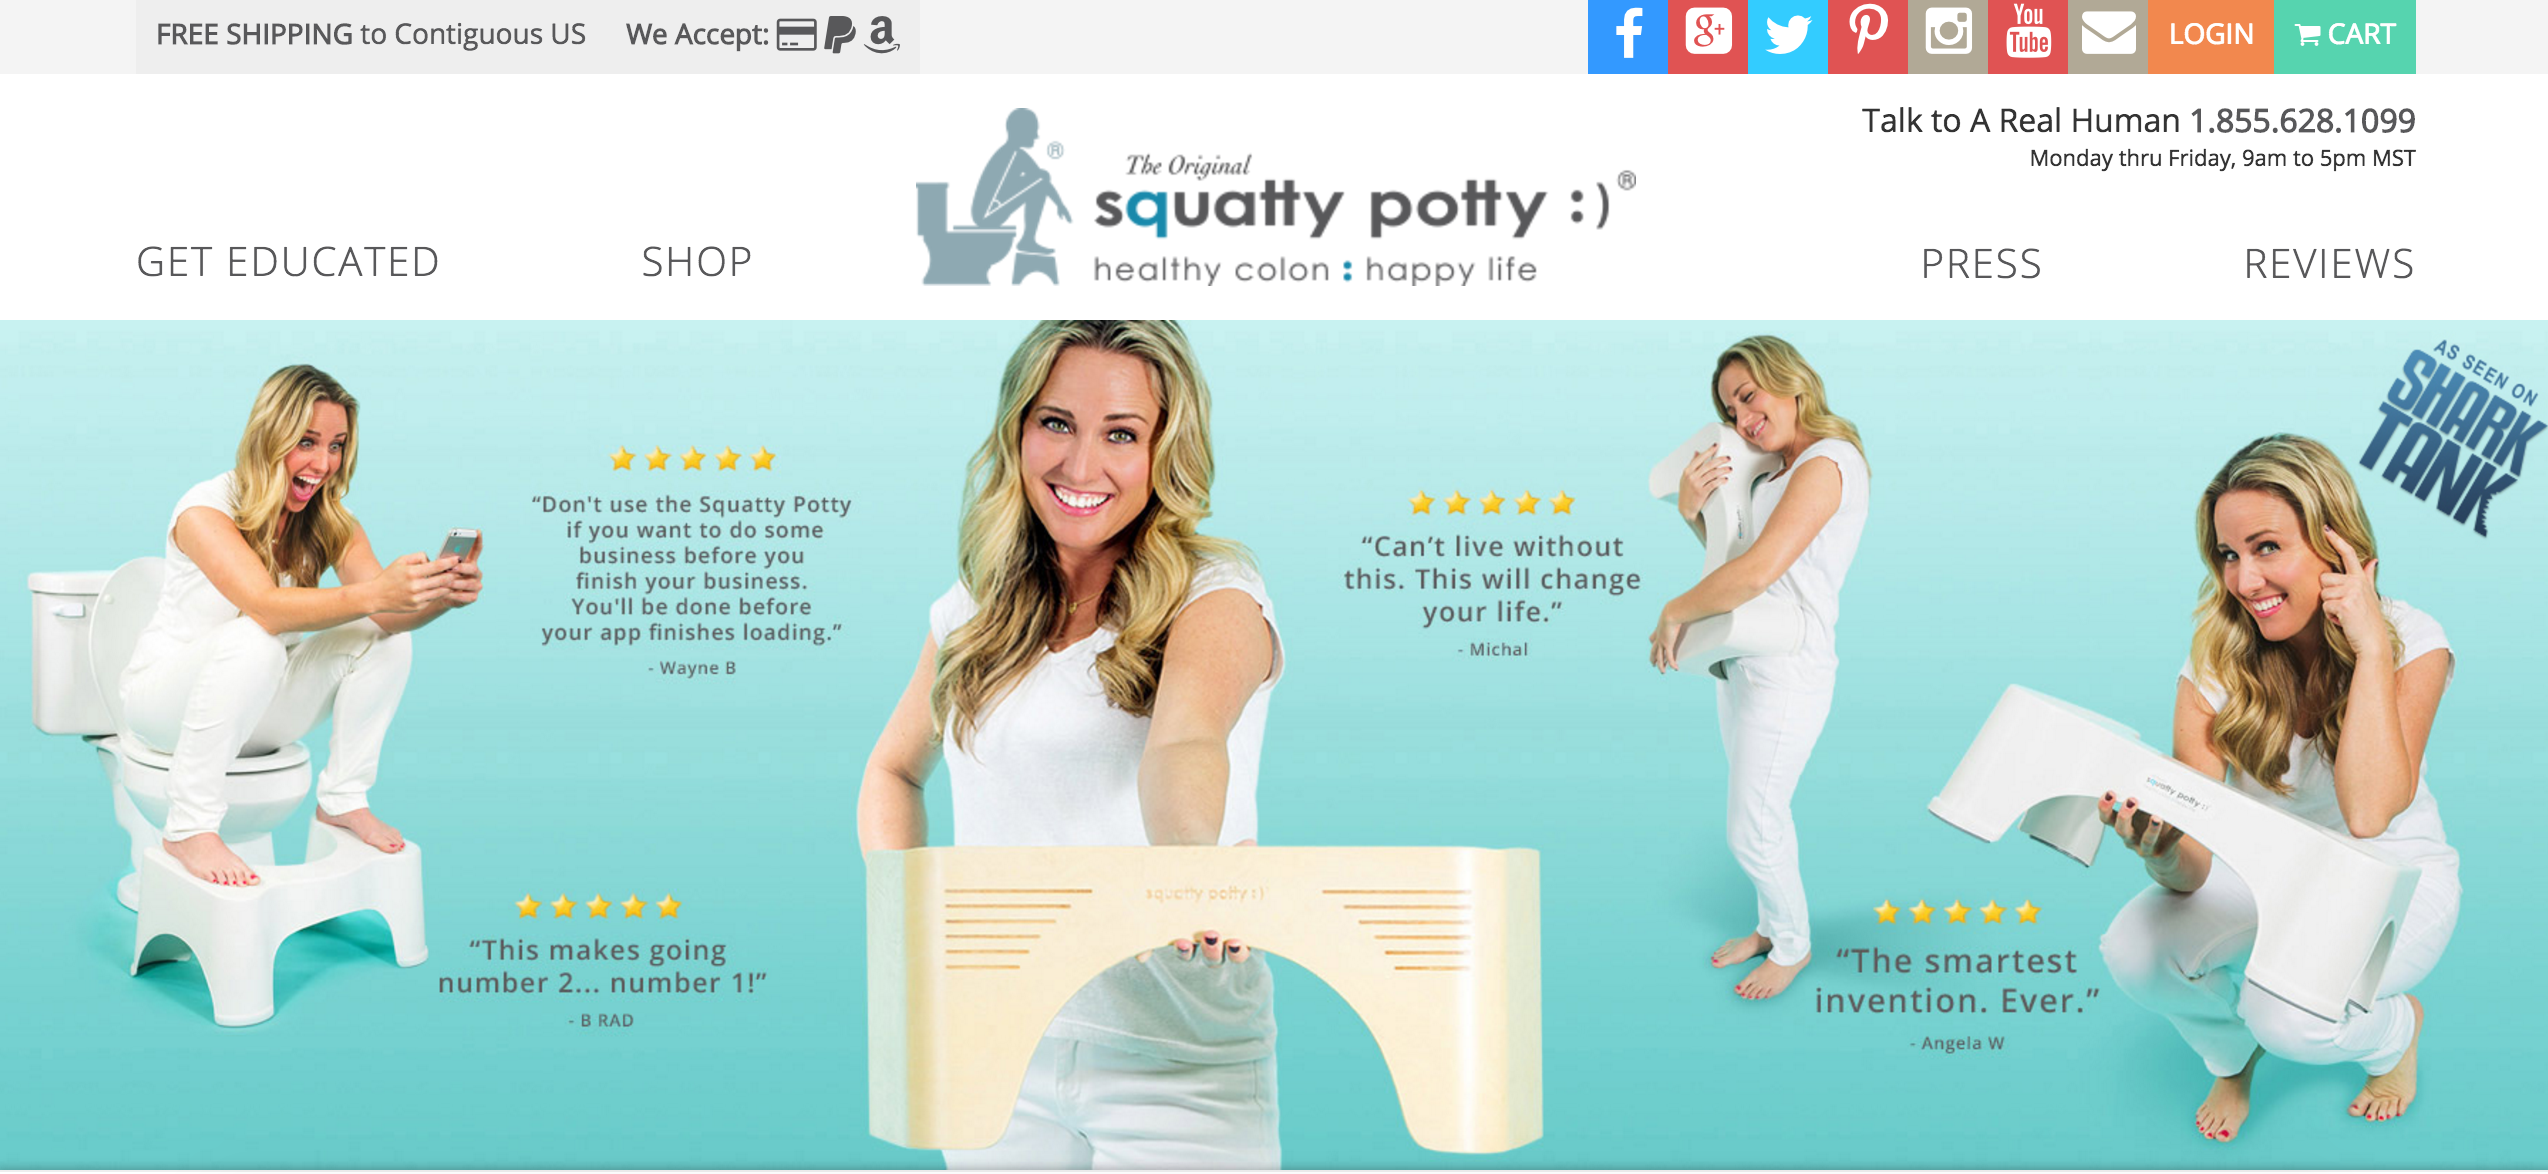 squatty potty content marketing